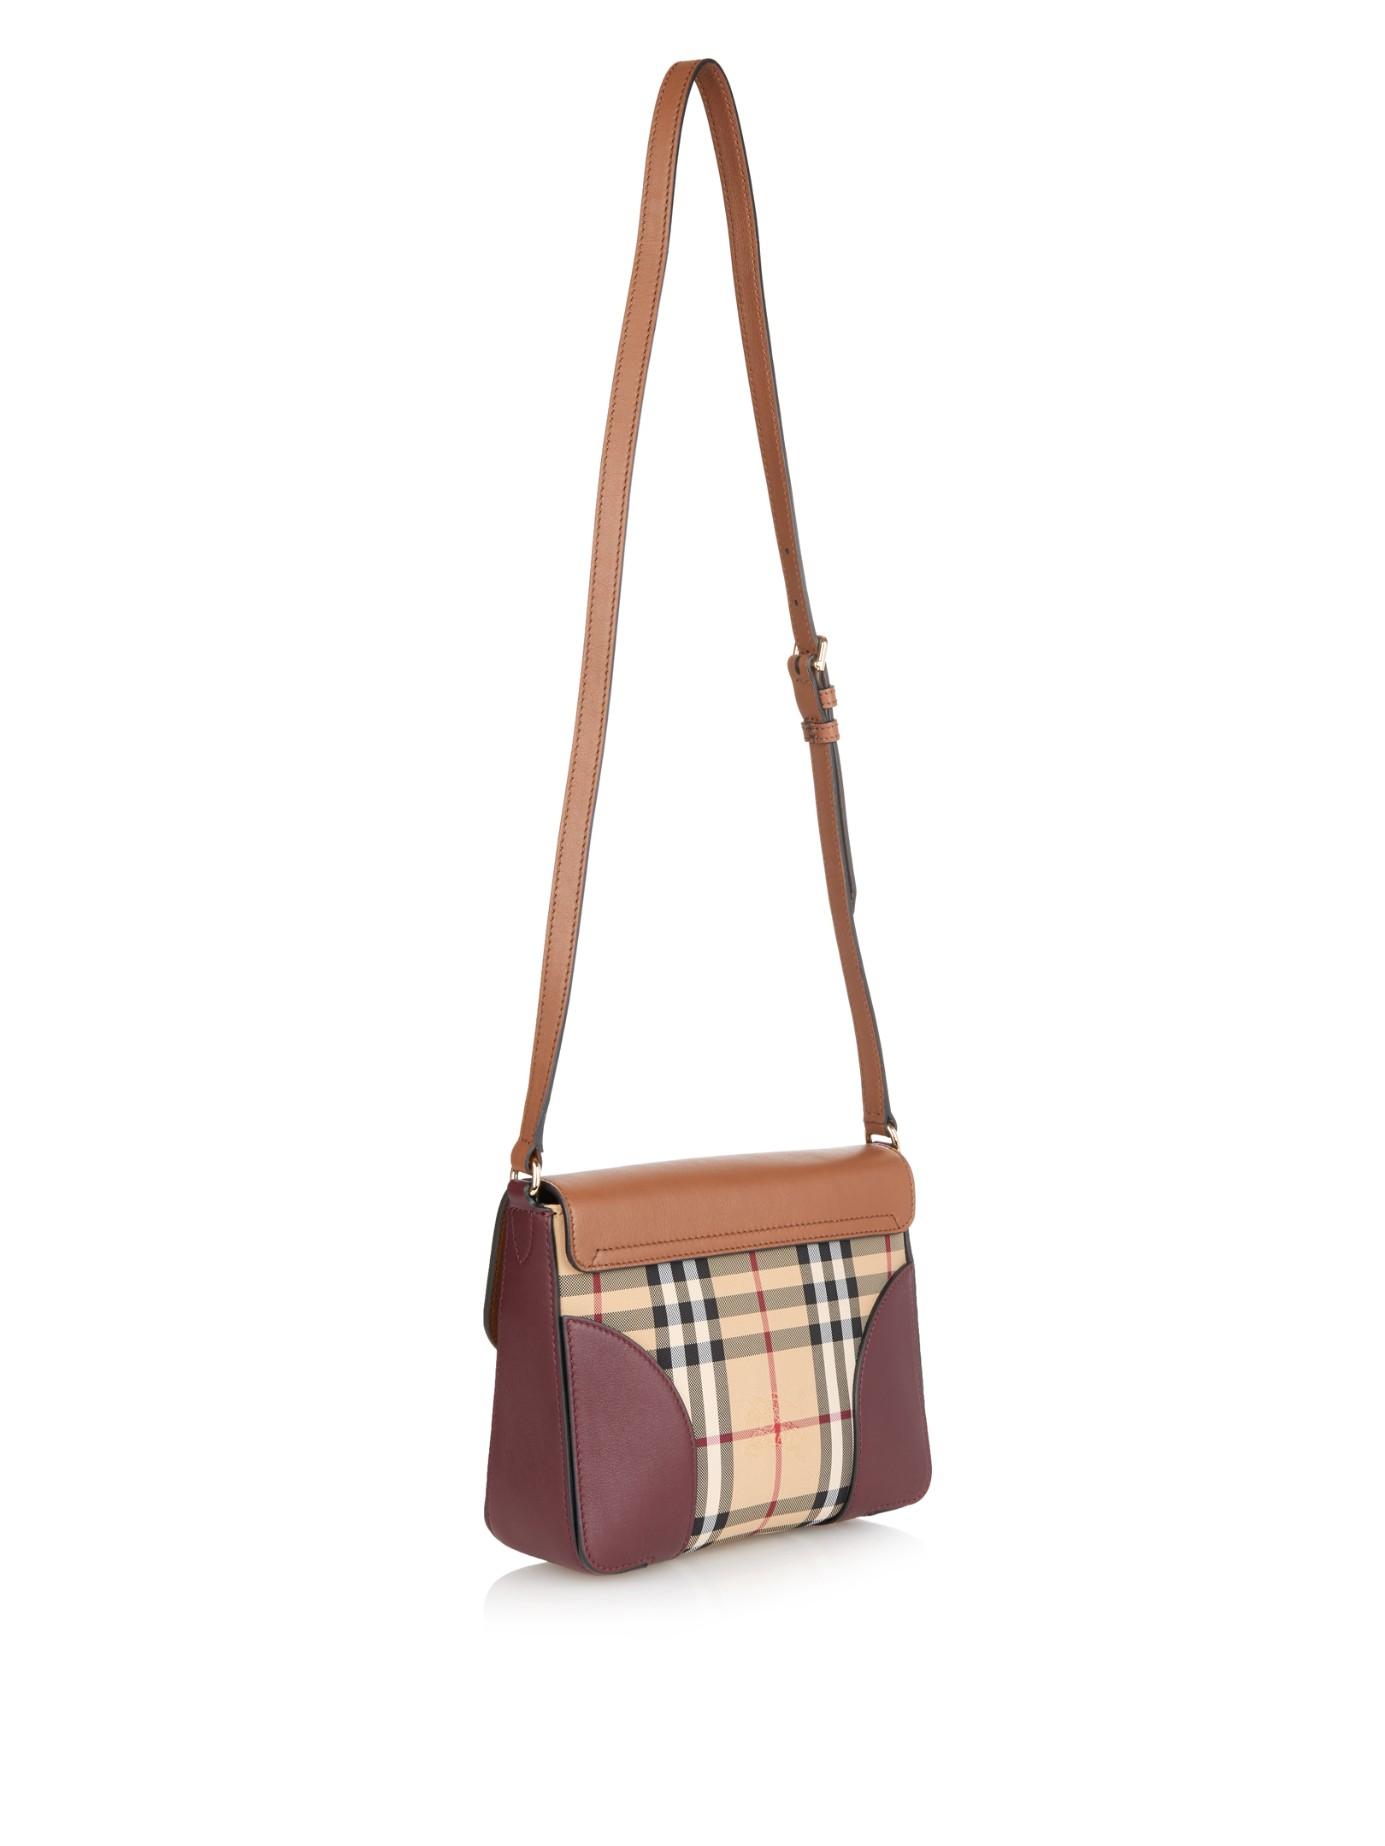 59d1239455e4 Lyst - Burberry Prorsum Dickens Leather Cross-body Bag in Purple